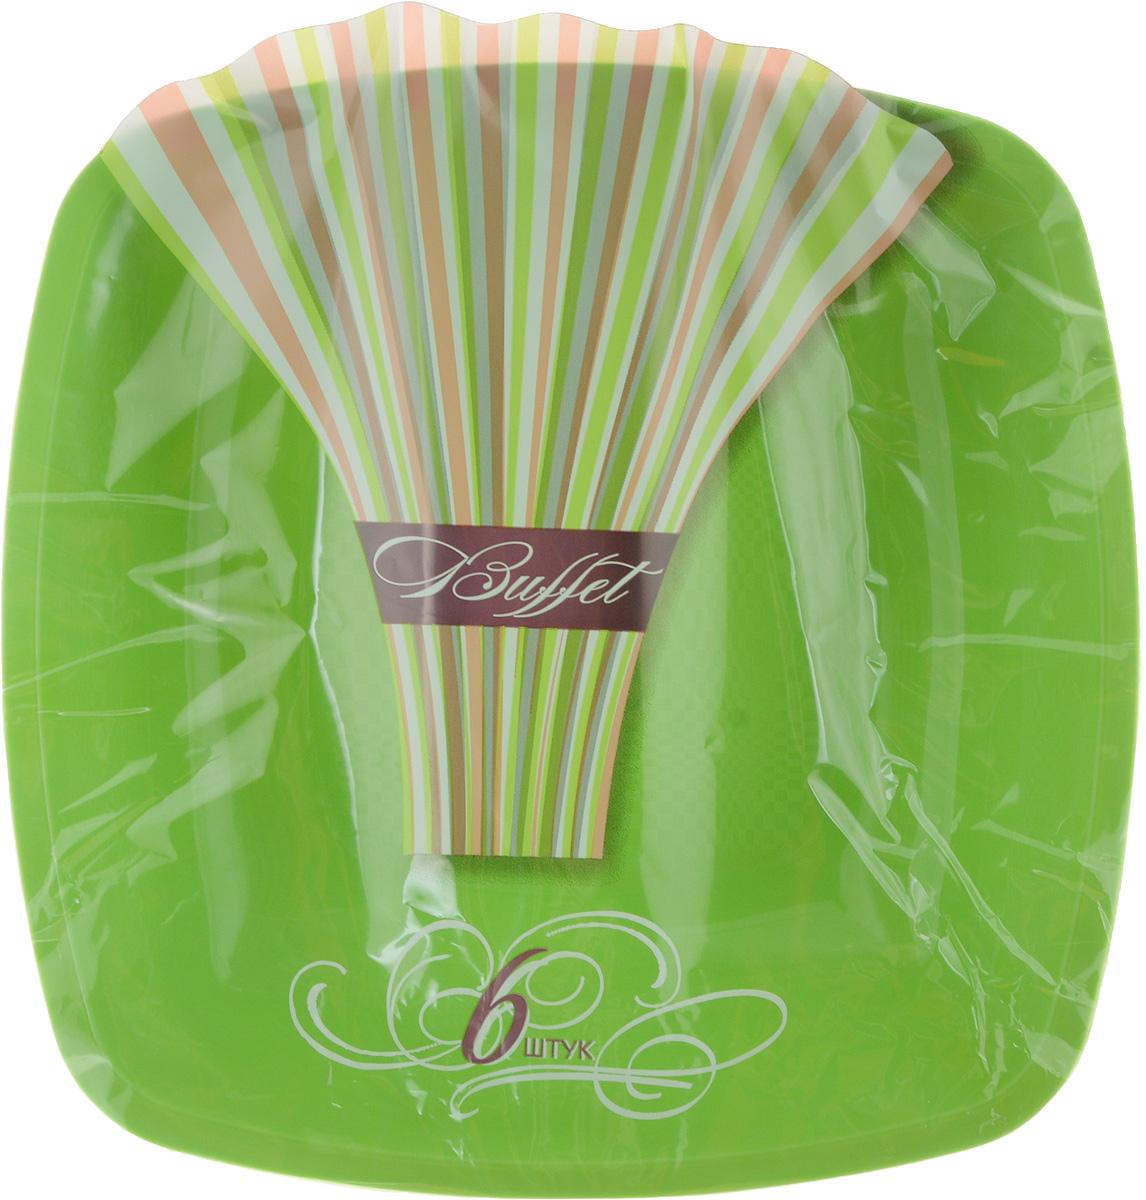 Набор одноразовых тарелок Buffet, цвет: зеленый, 18 х 18 см, 6 шт набор одноразовых стаканов buffet biсolor цвет оранжевый желтый 200 мл 6 шт